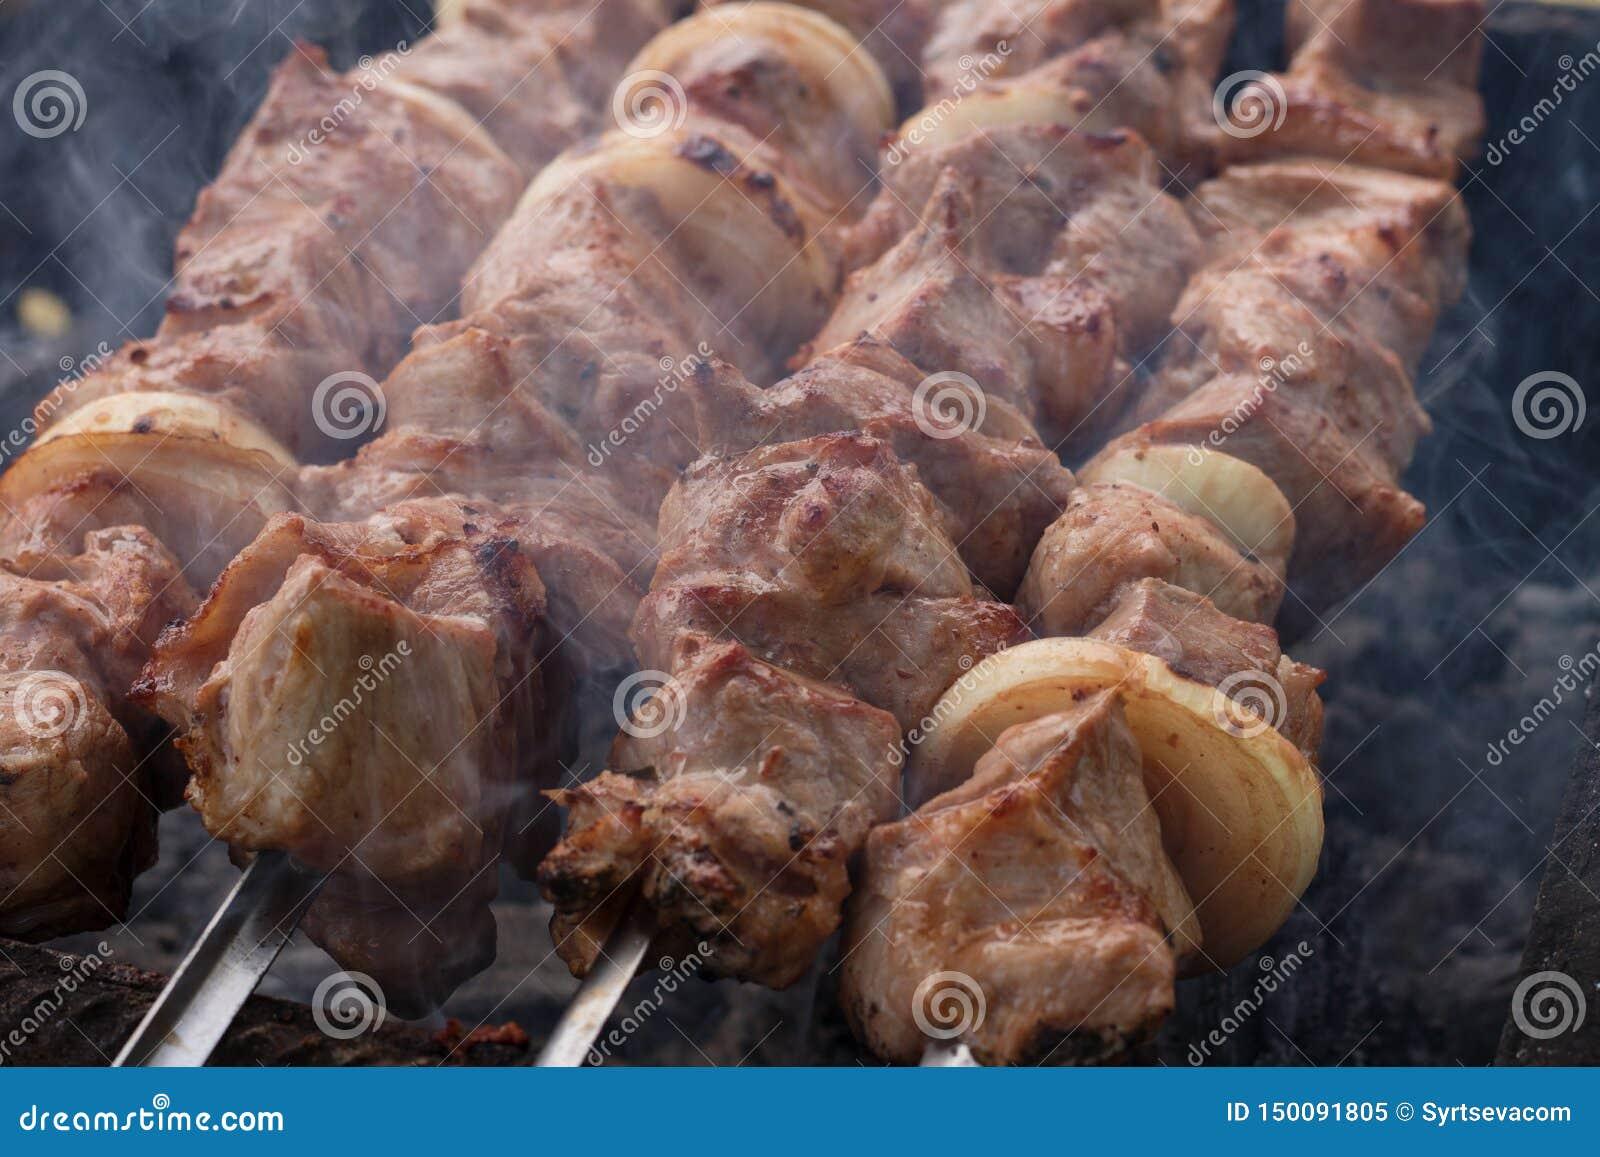 Зажаренное мясо на гриле на природе, на горячих углях, дым